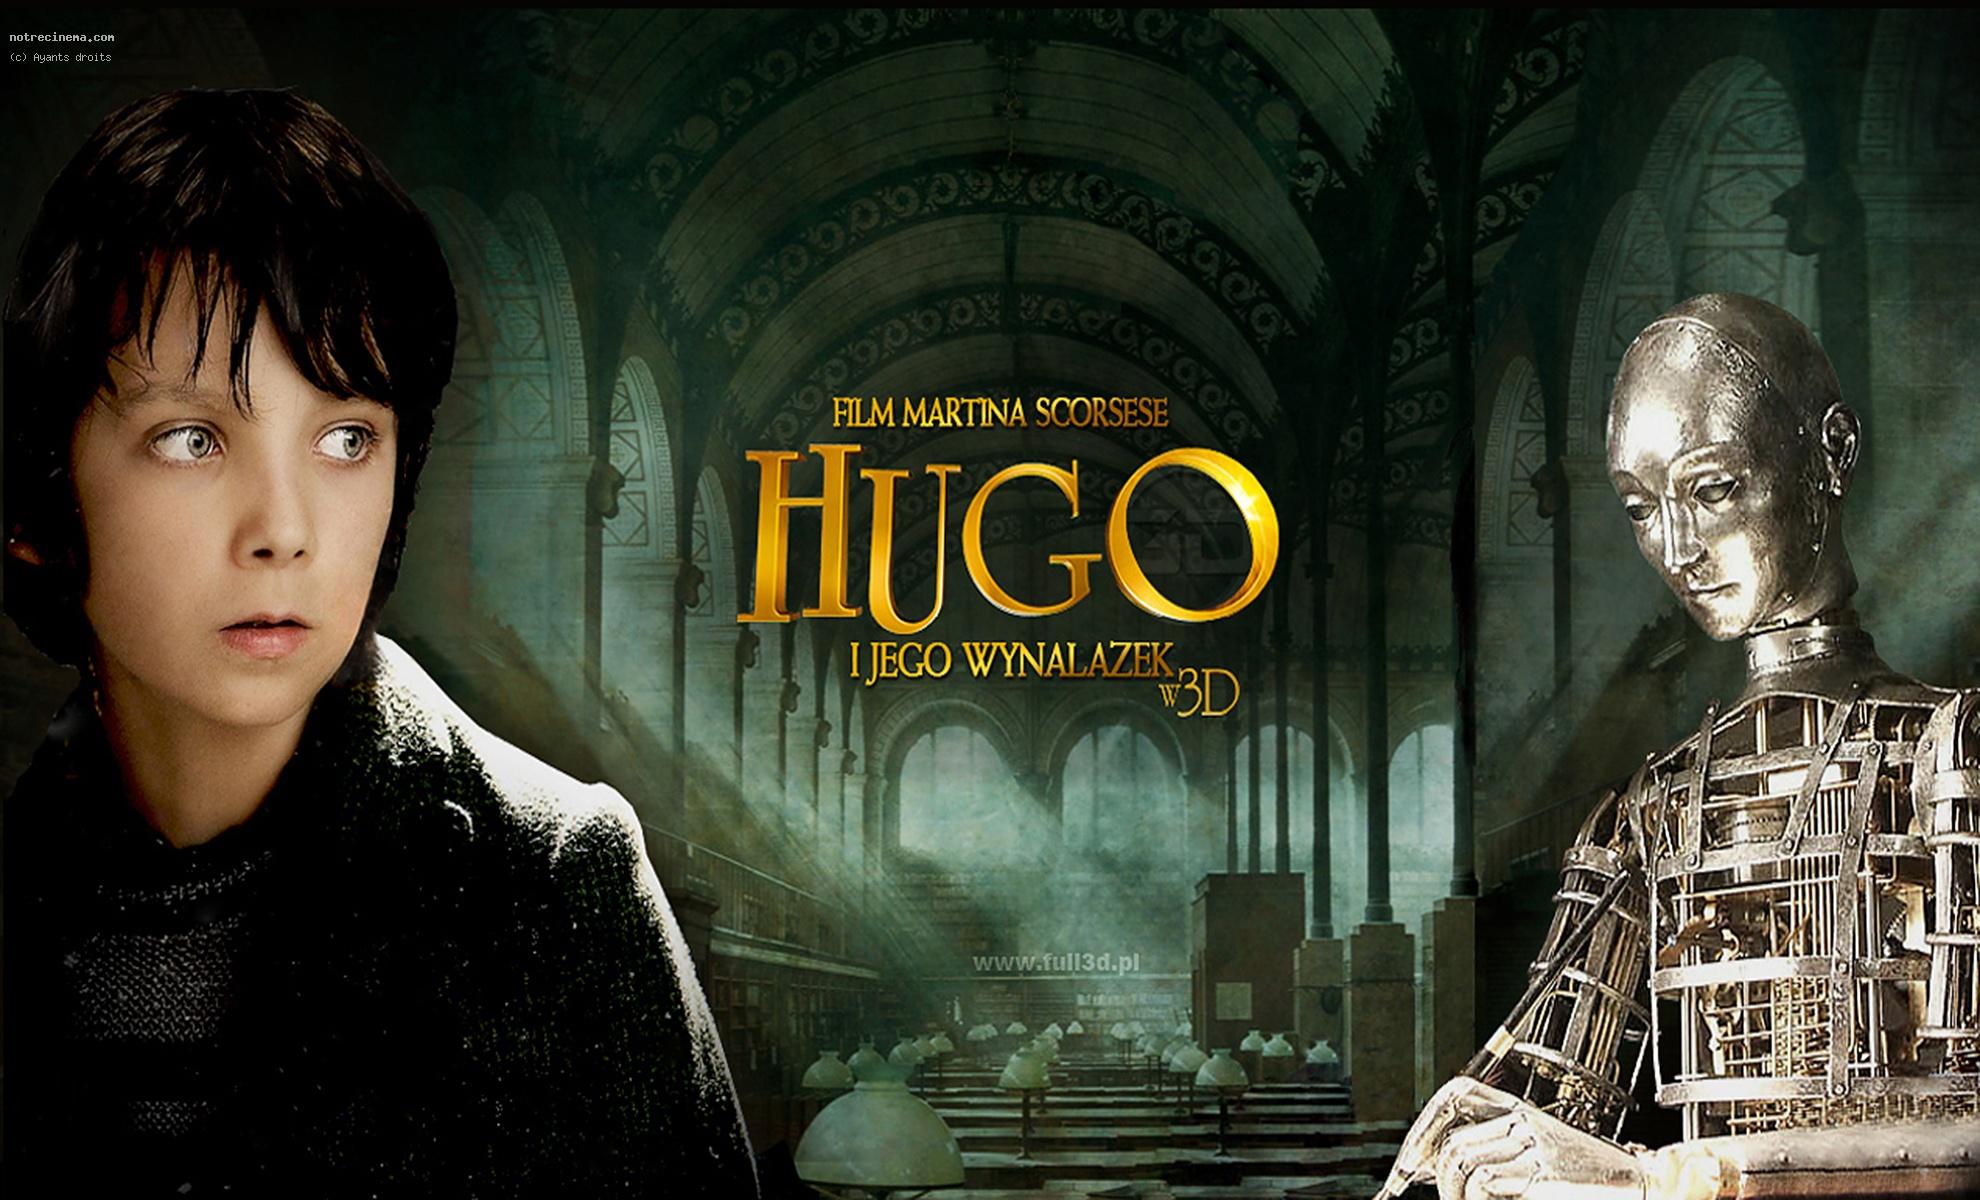 God Inspirational Quotes Wallpaper Hugo Cabret Quotes Quotesgram